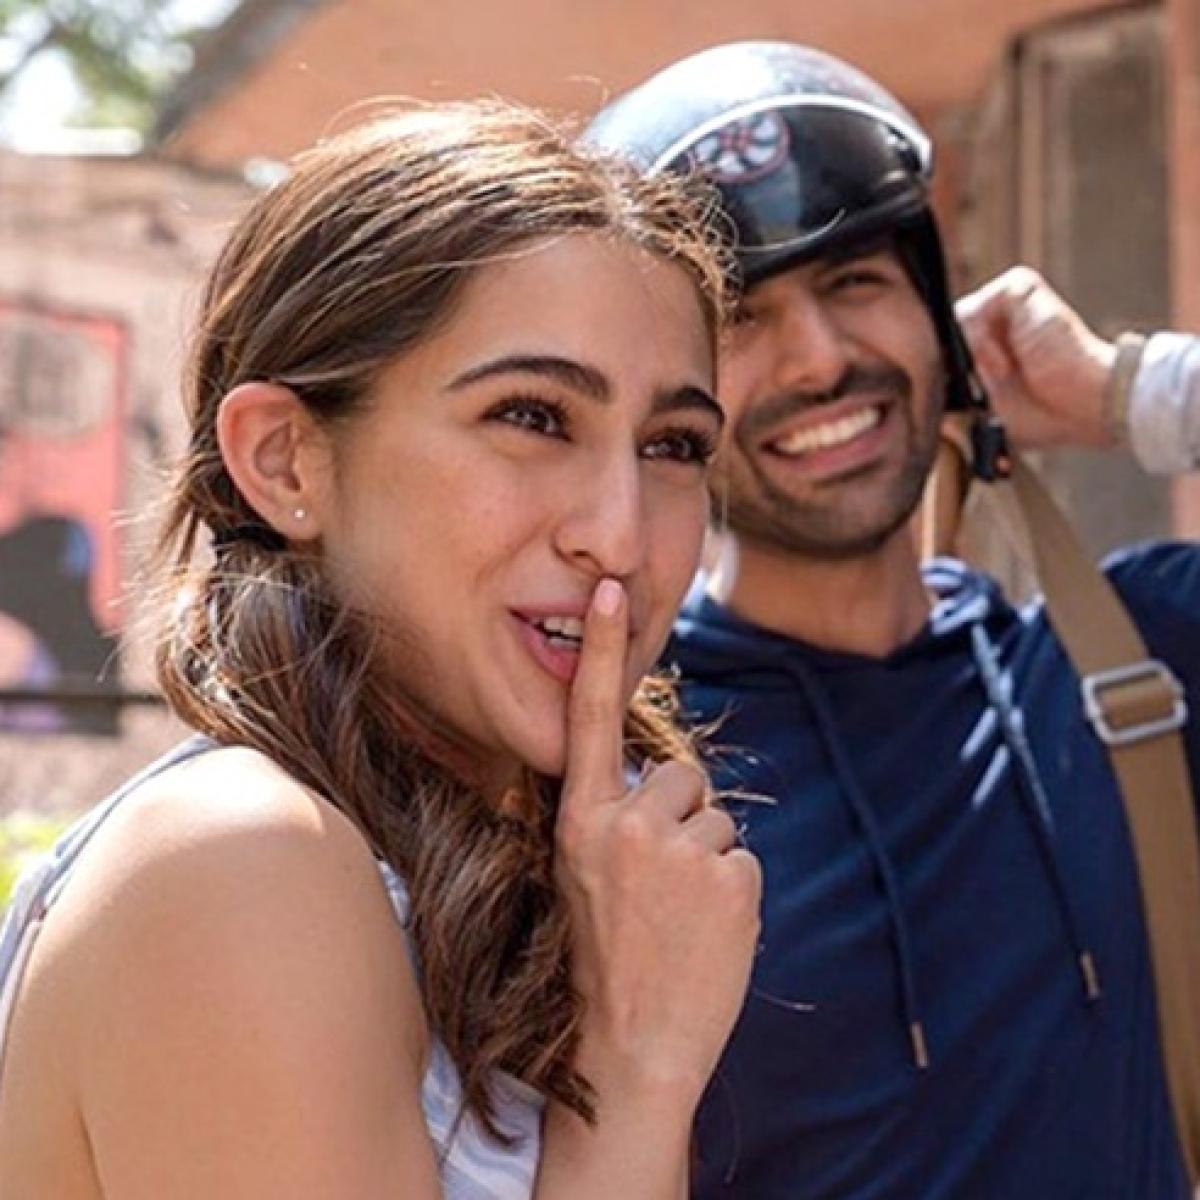 Kartik Aaryan shares BTS from 'Love Aaj Kal', calls Sara Ali Khan 'amma'